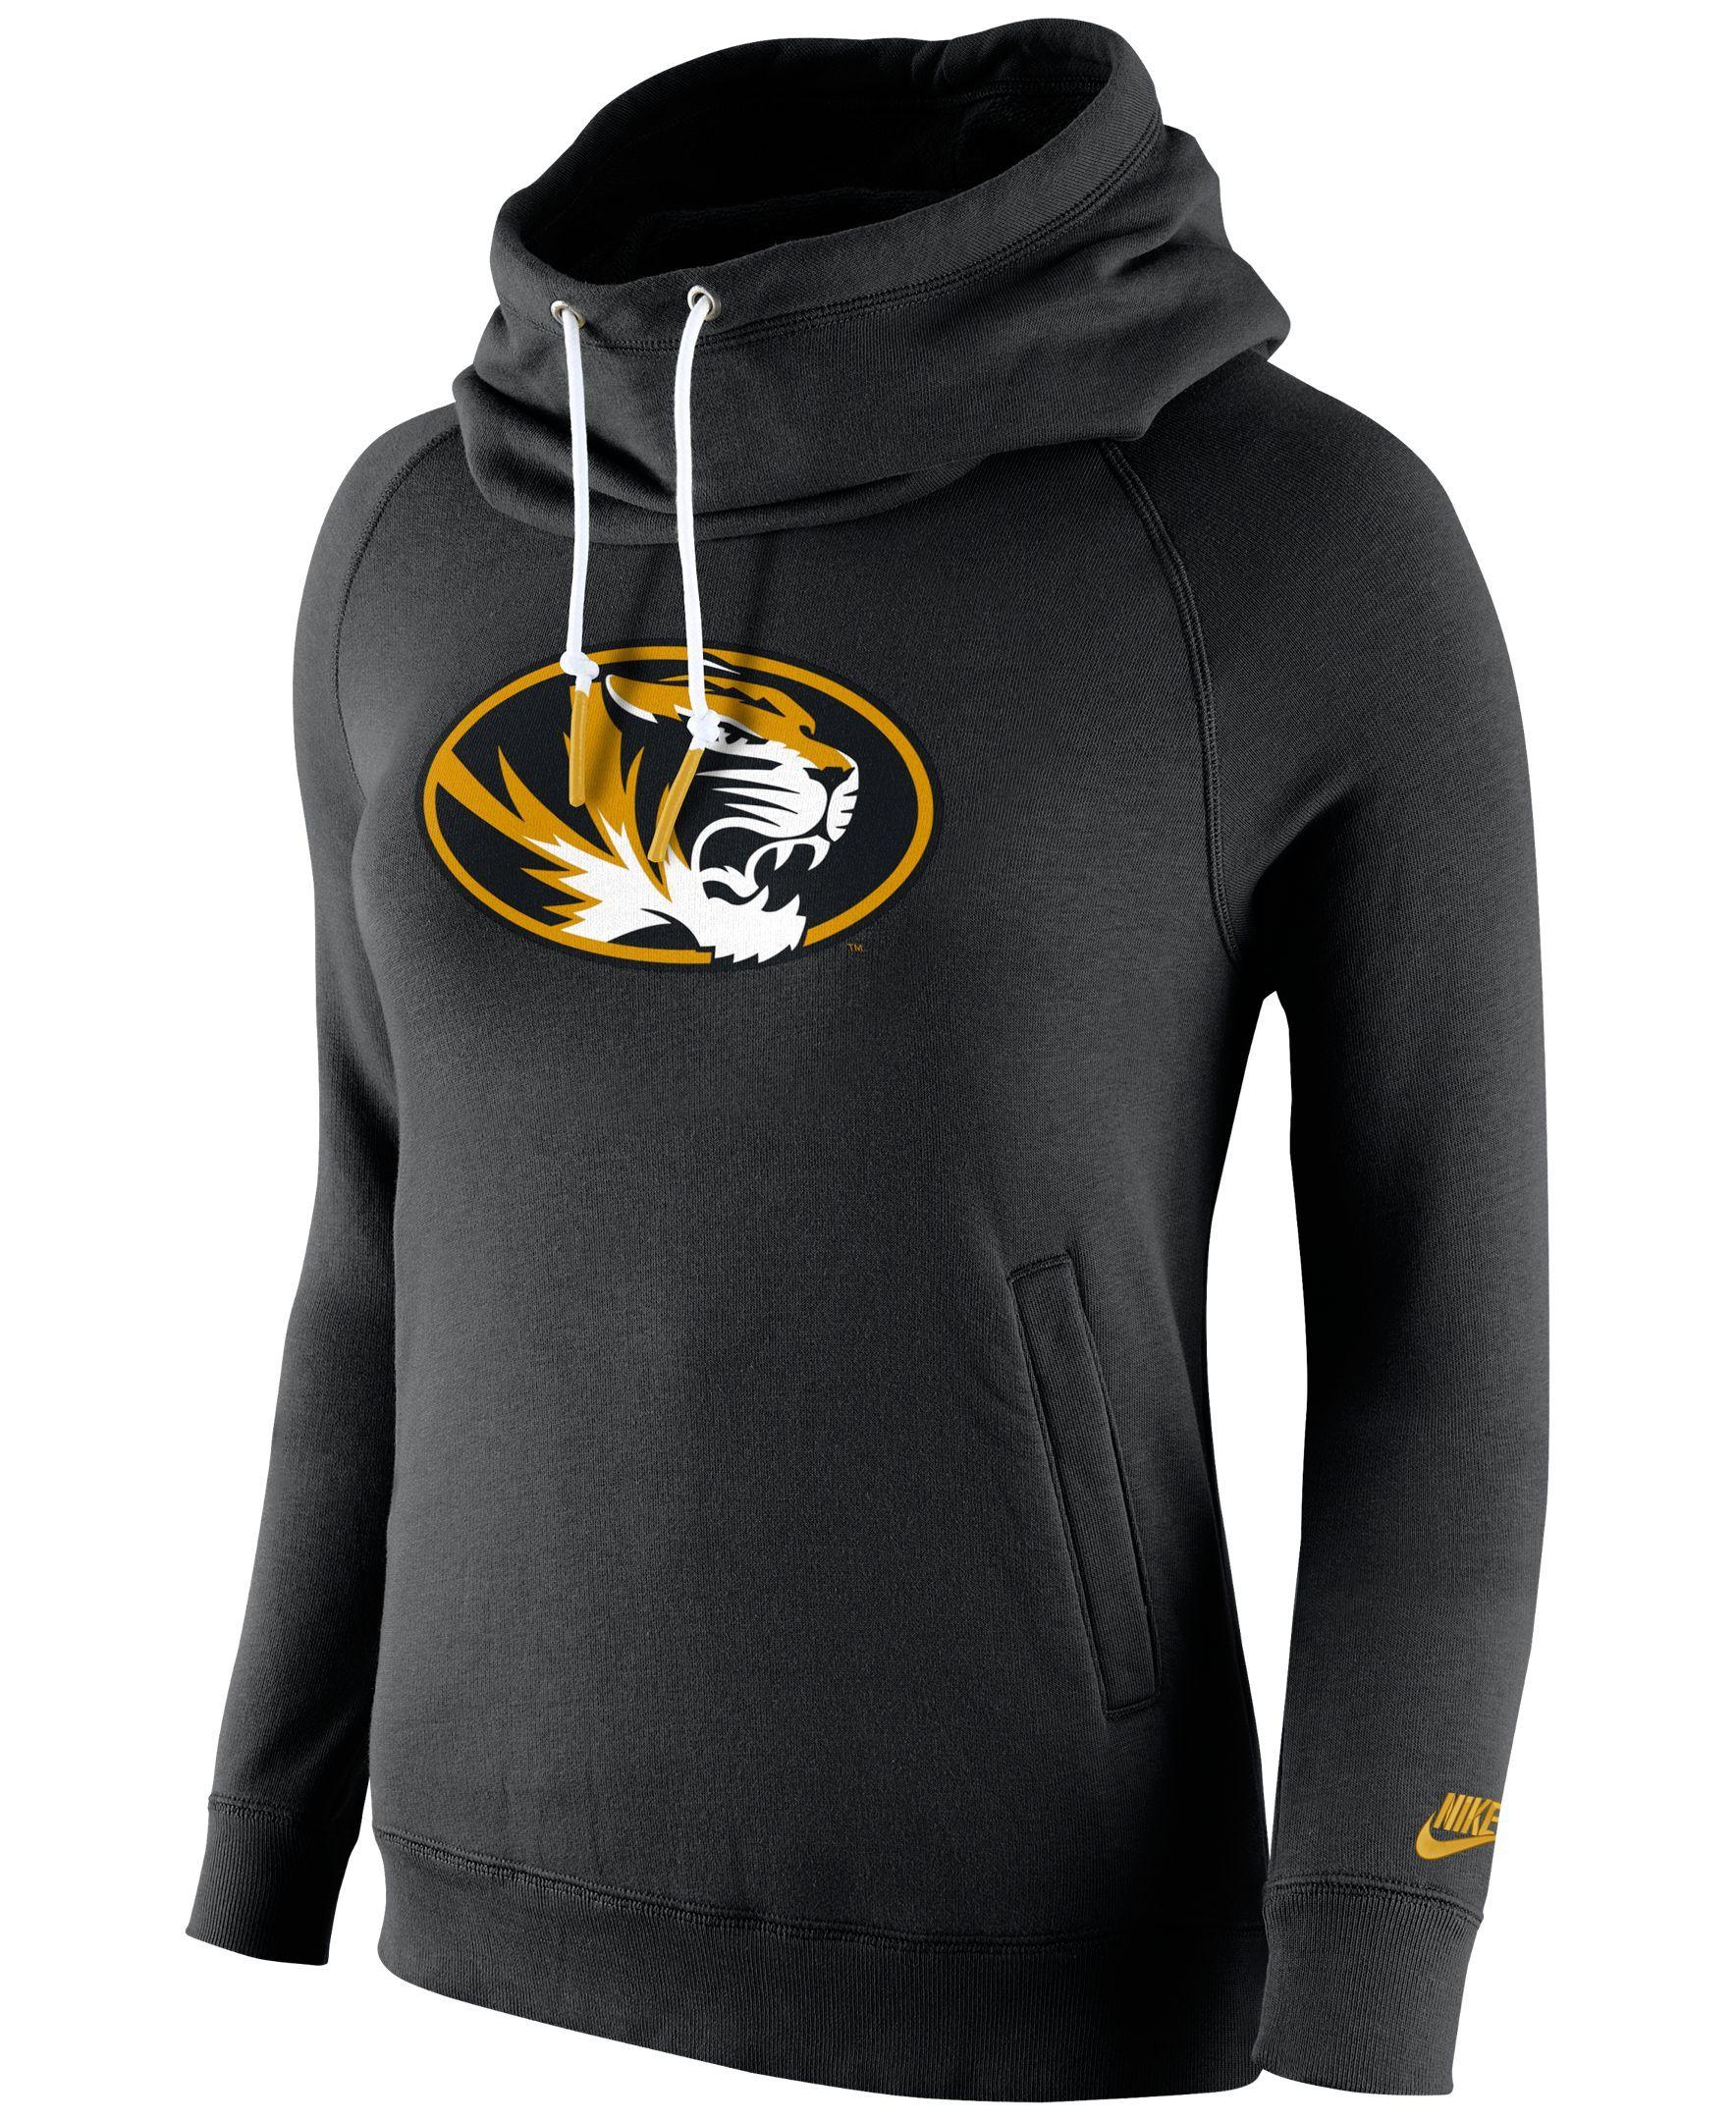 Nike Women S Missouri Tigers Rally Funnel Hoodie Nike Women Penn State Clothes Hoodies [ 2160 x 1768 Pixel ]